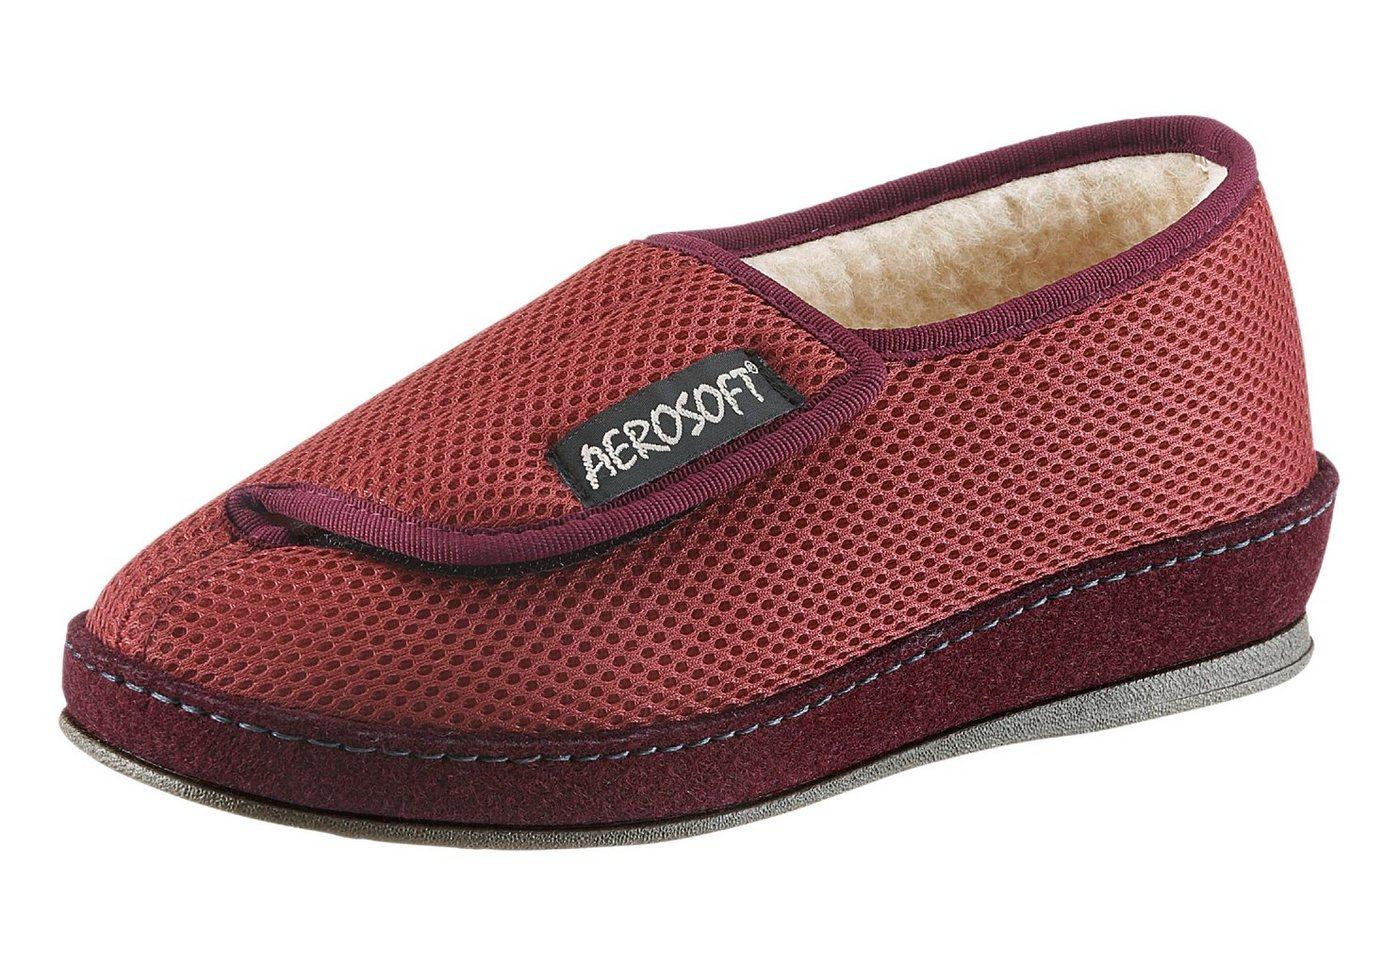 Aerosoft Hausschuh mit rutschhemmender PVC-Laufsohle | Schuhe > Hausschuhe > Klassische Hausschuhe | Rot | Classic